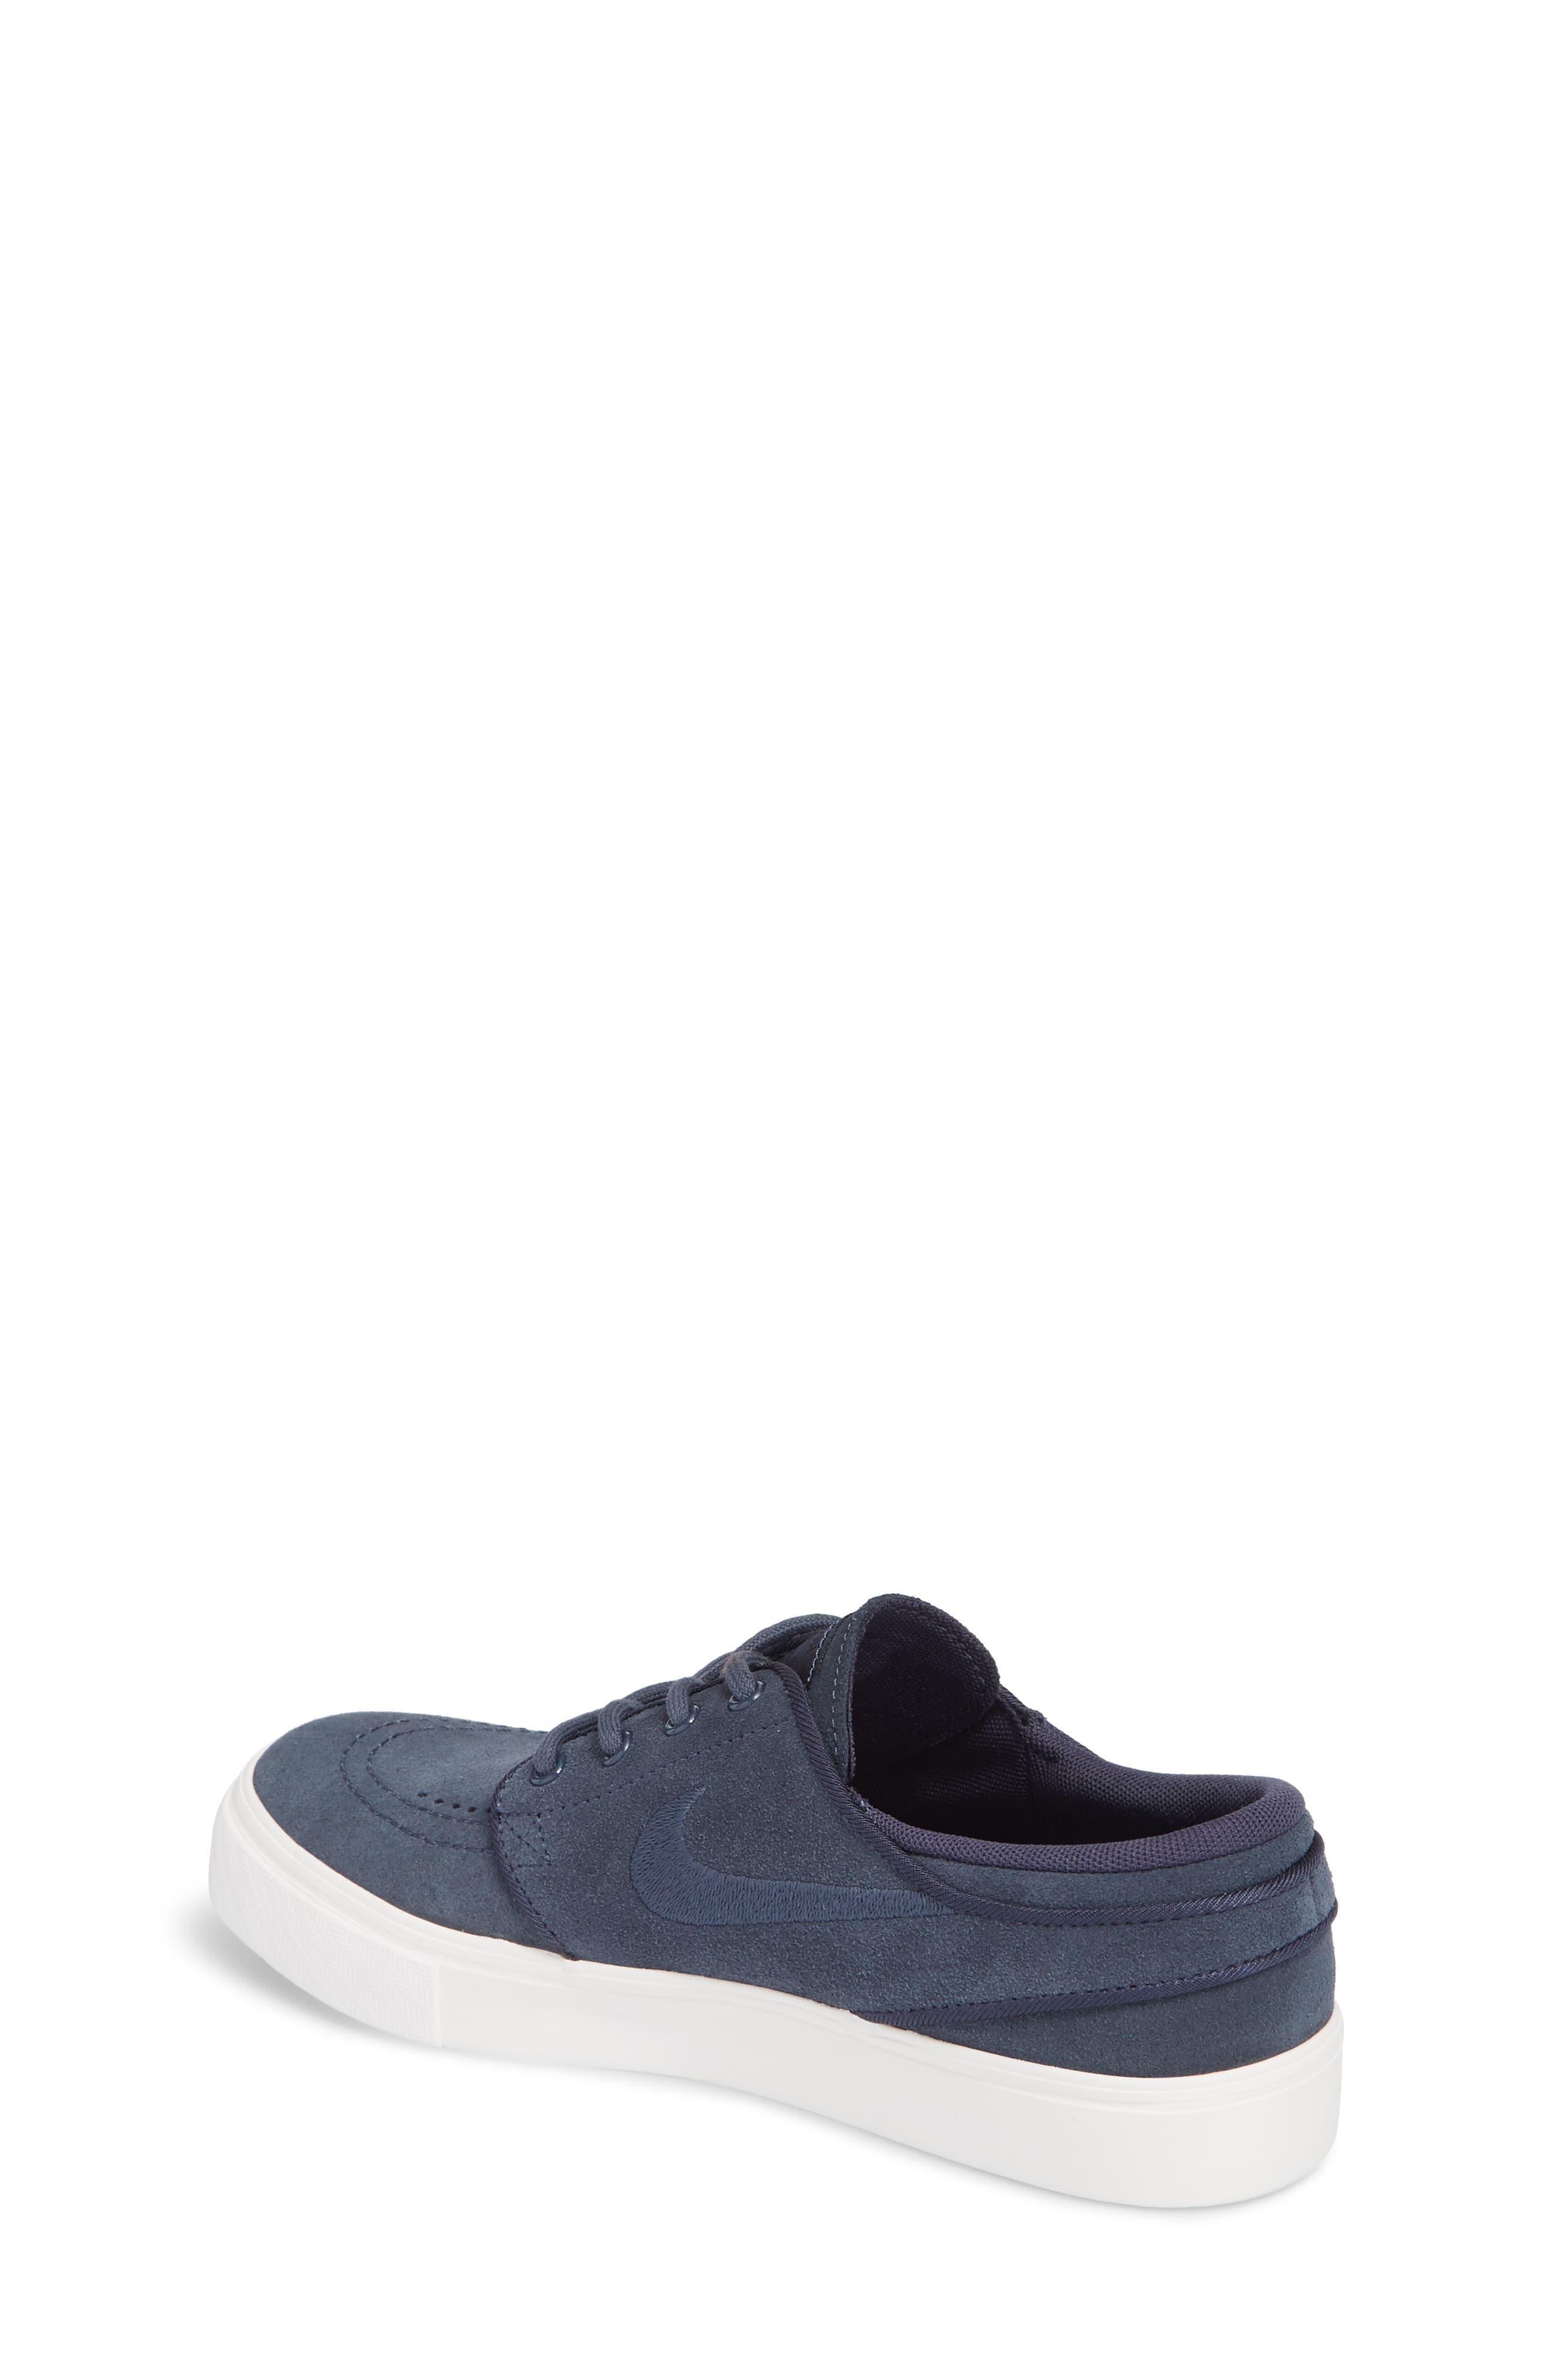 'Stefan Janoski' Sneaker,                             Alternate thumbnail 15, color,